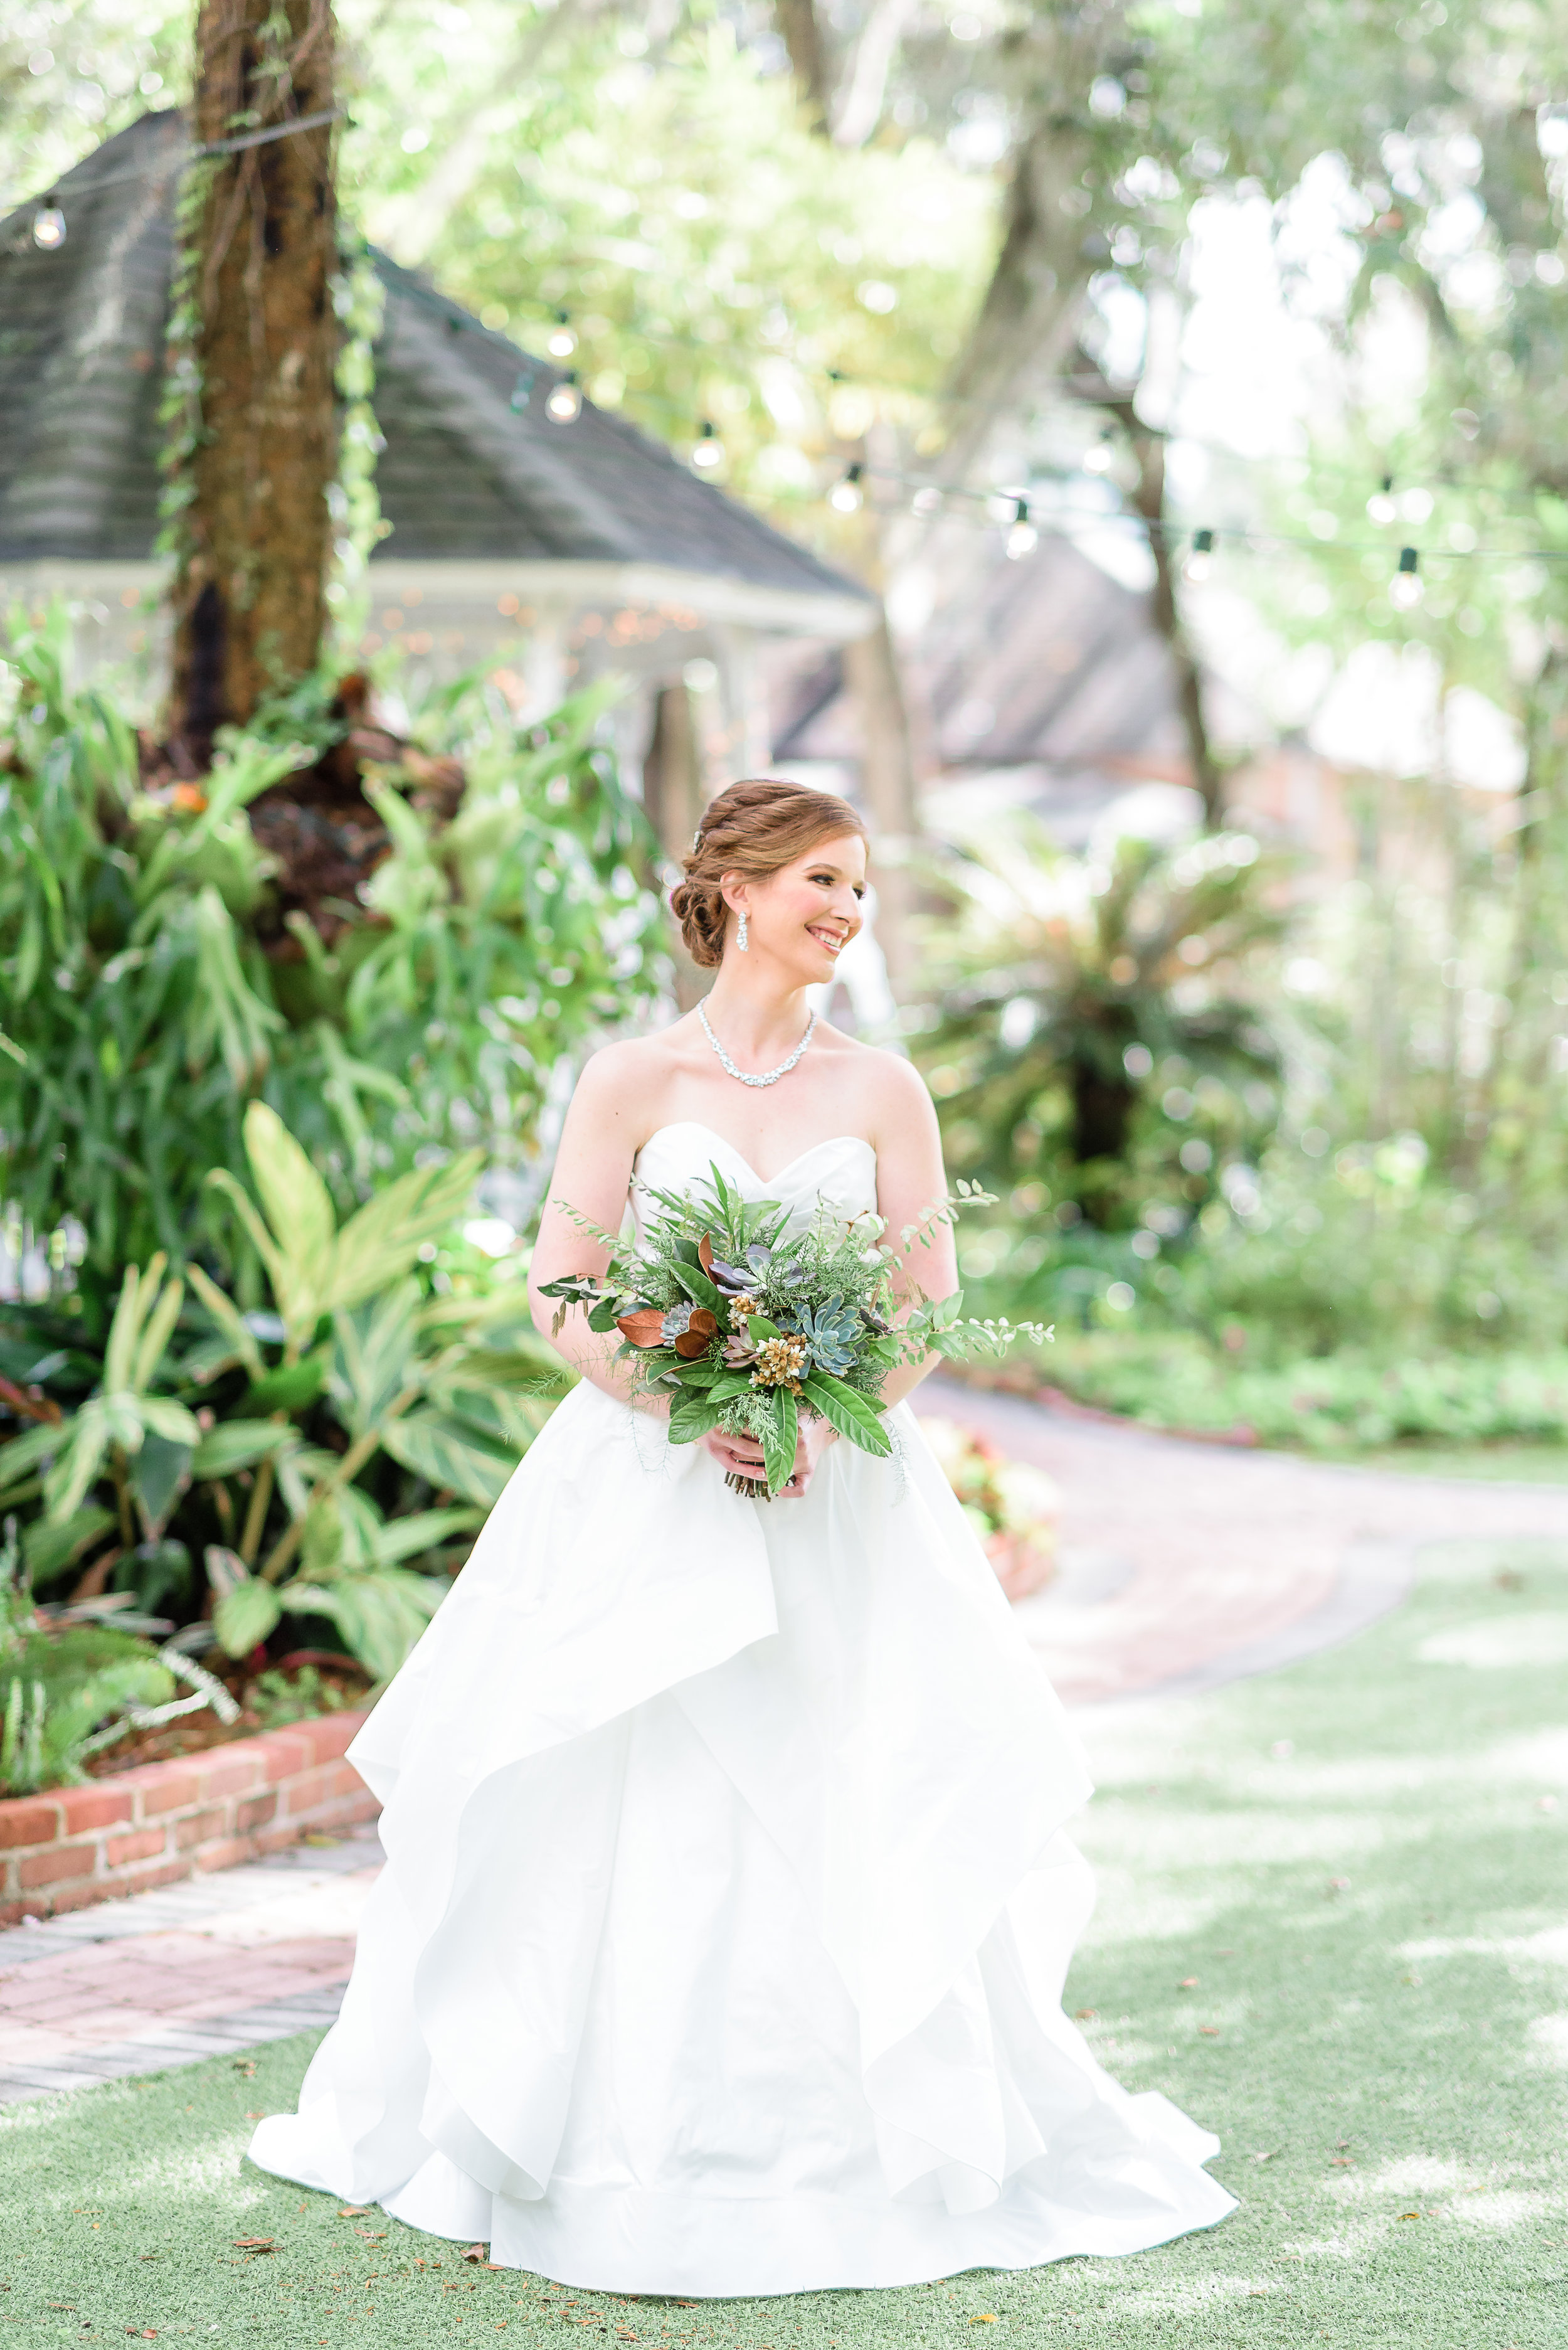 The Veil Wedding Photography